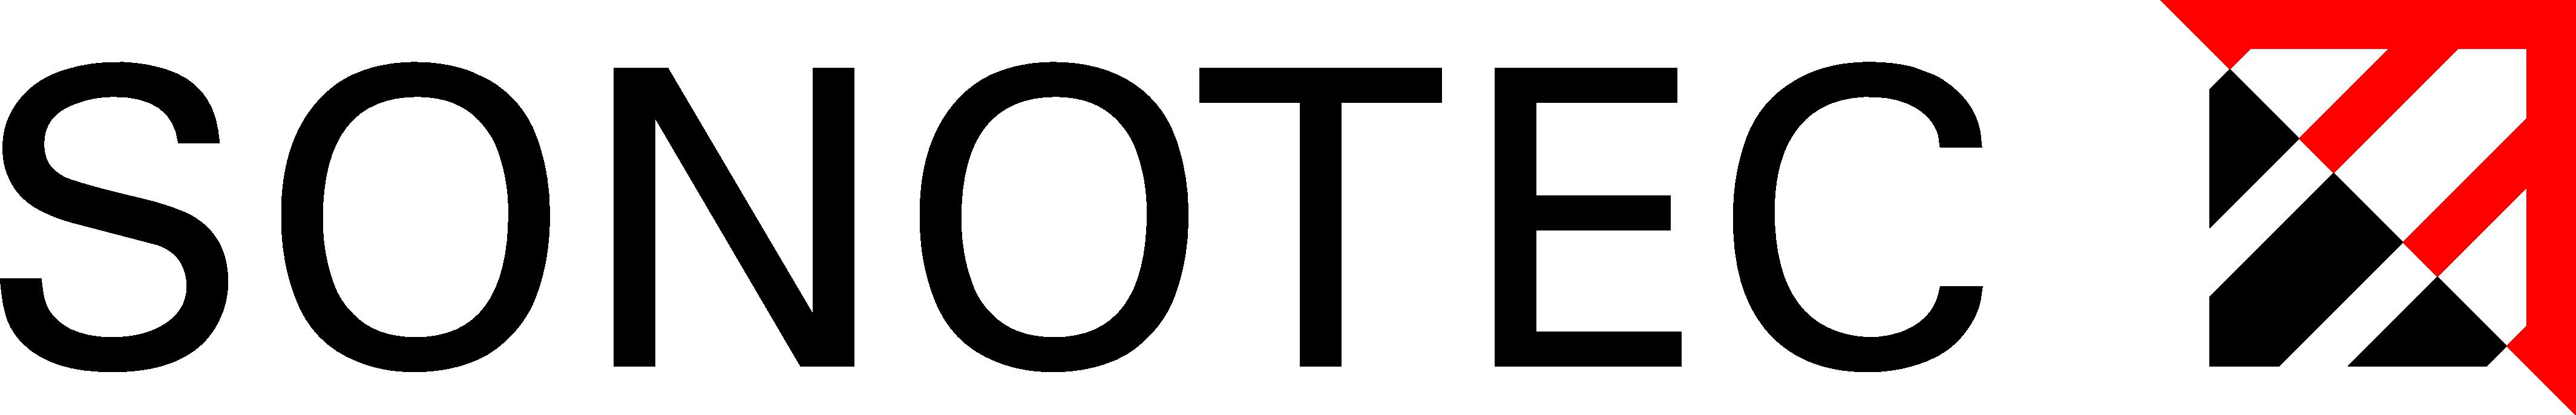 SONOTECH